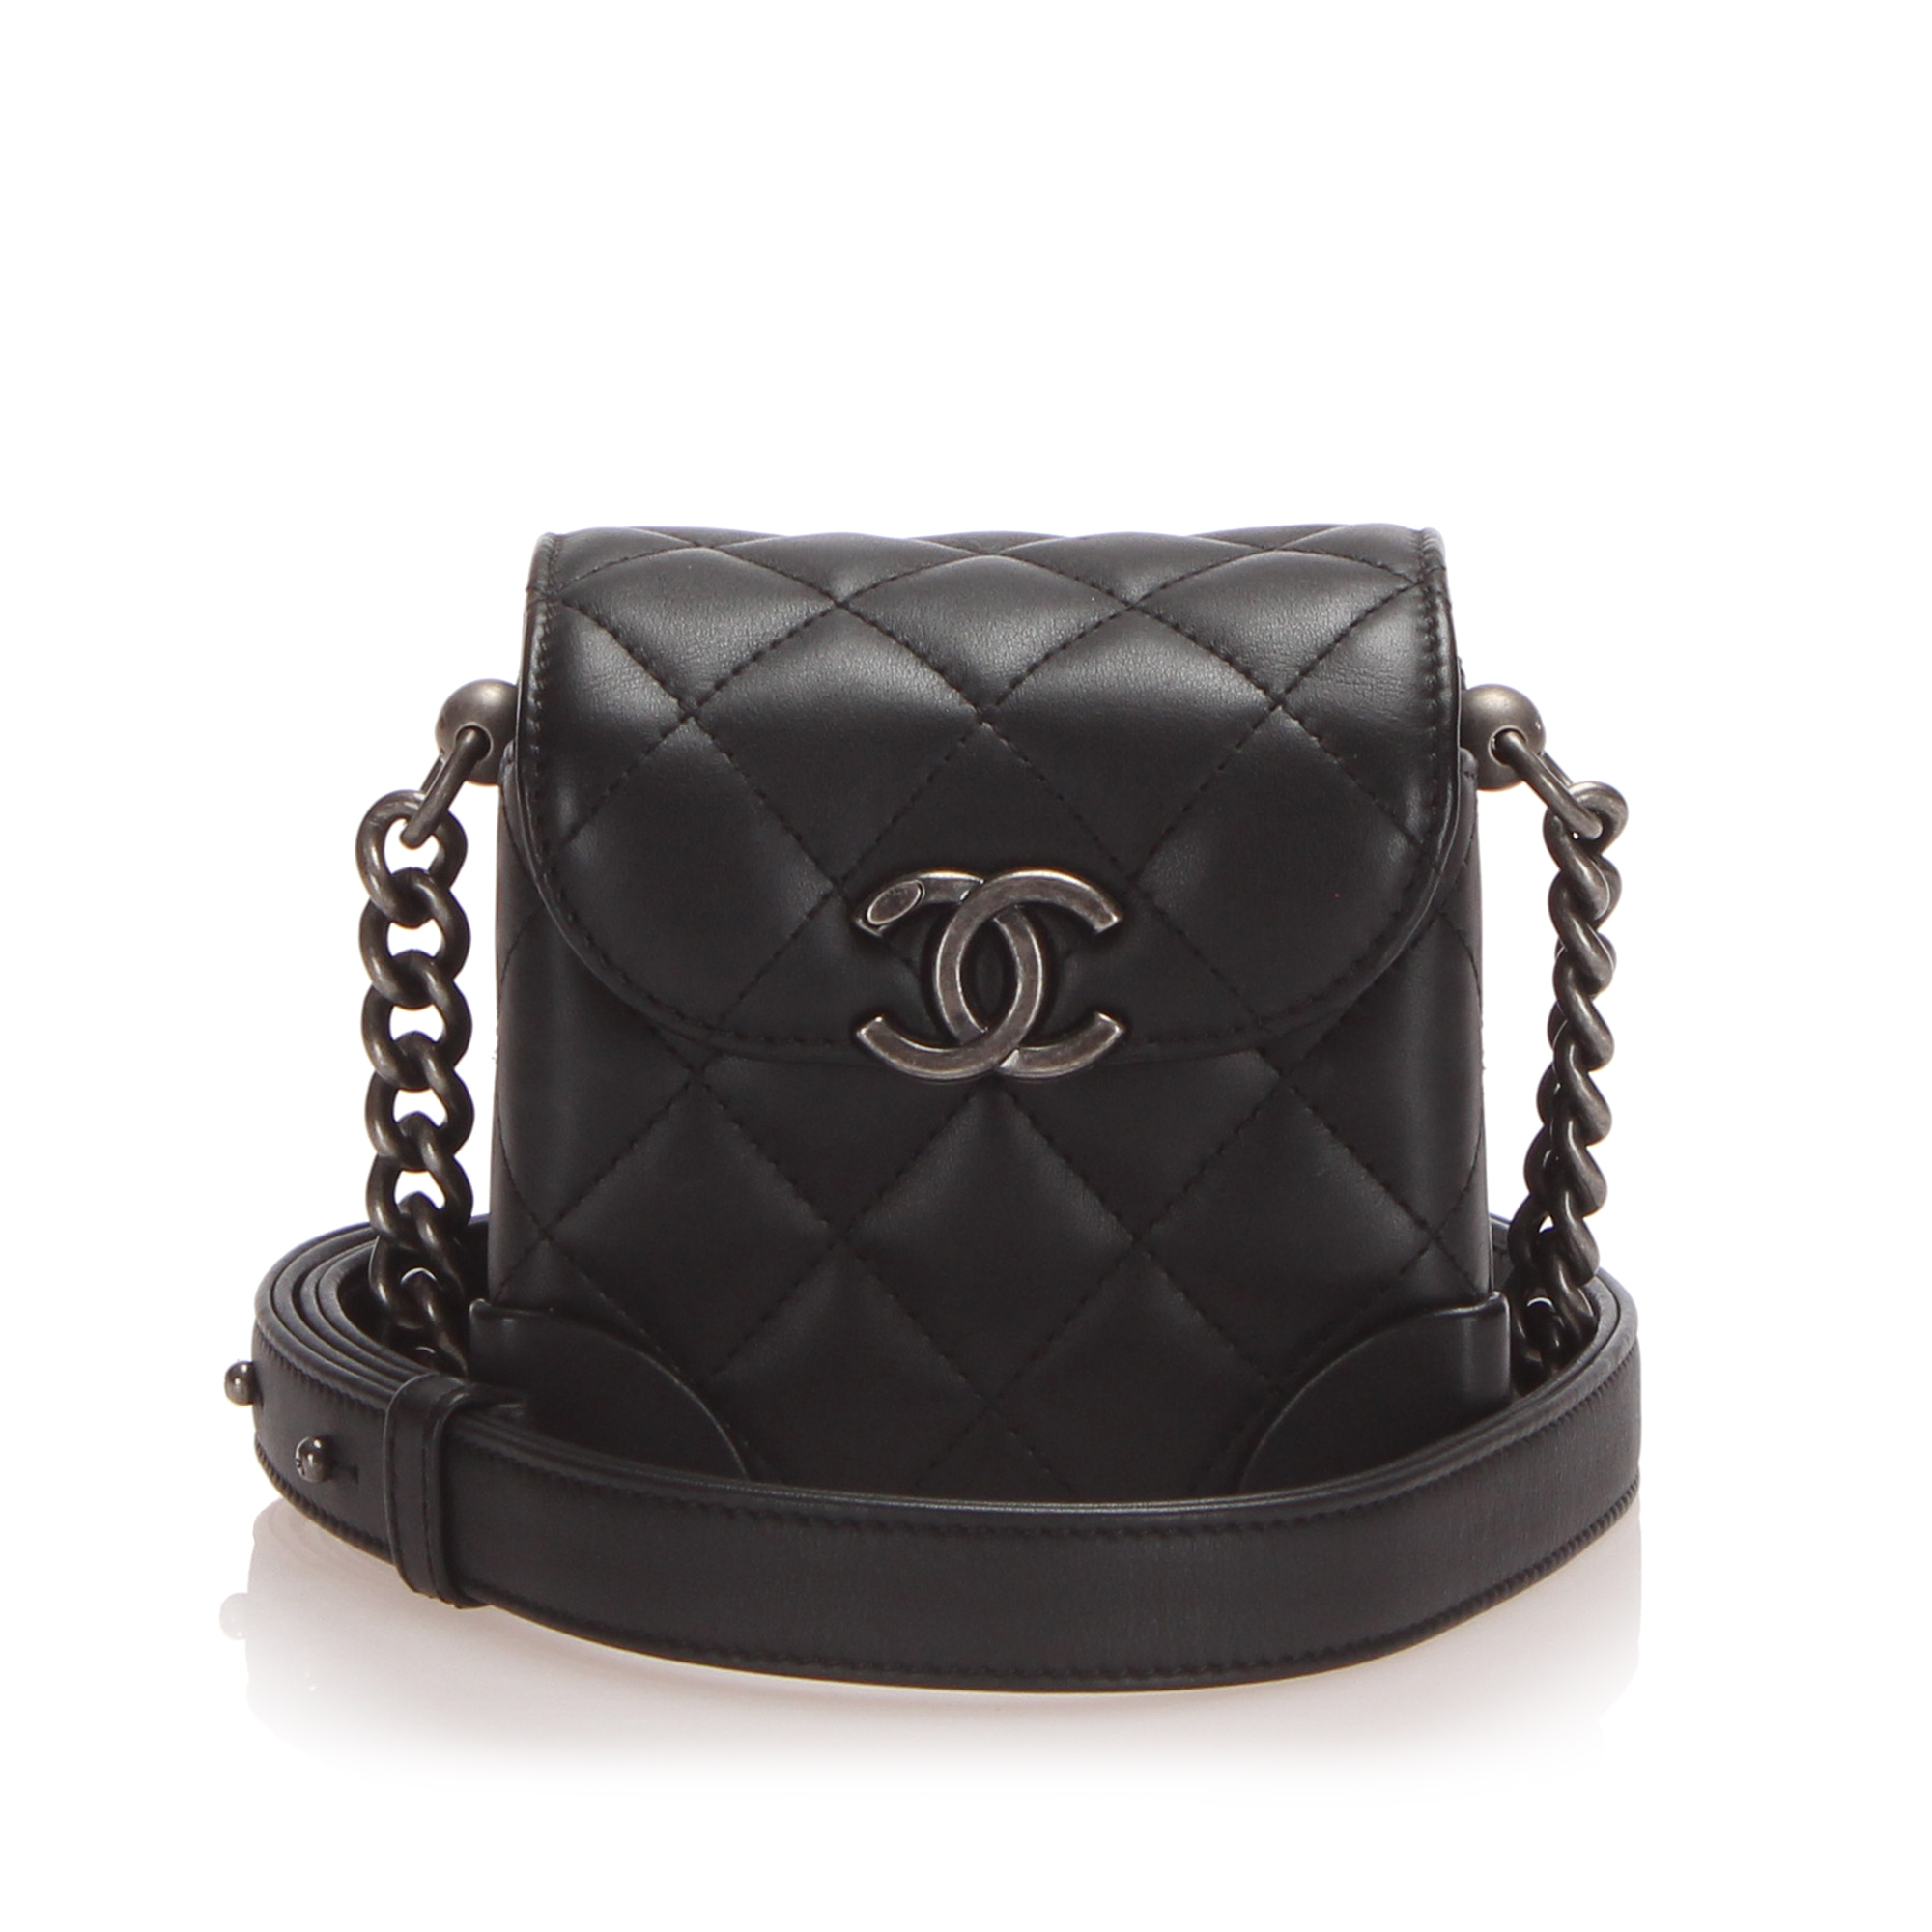 Chanel Matelasse Lambskin Leather Chain Vanity Bag